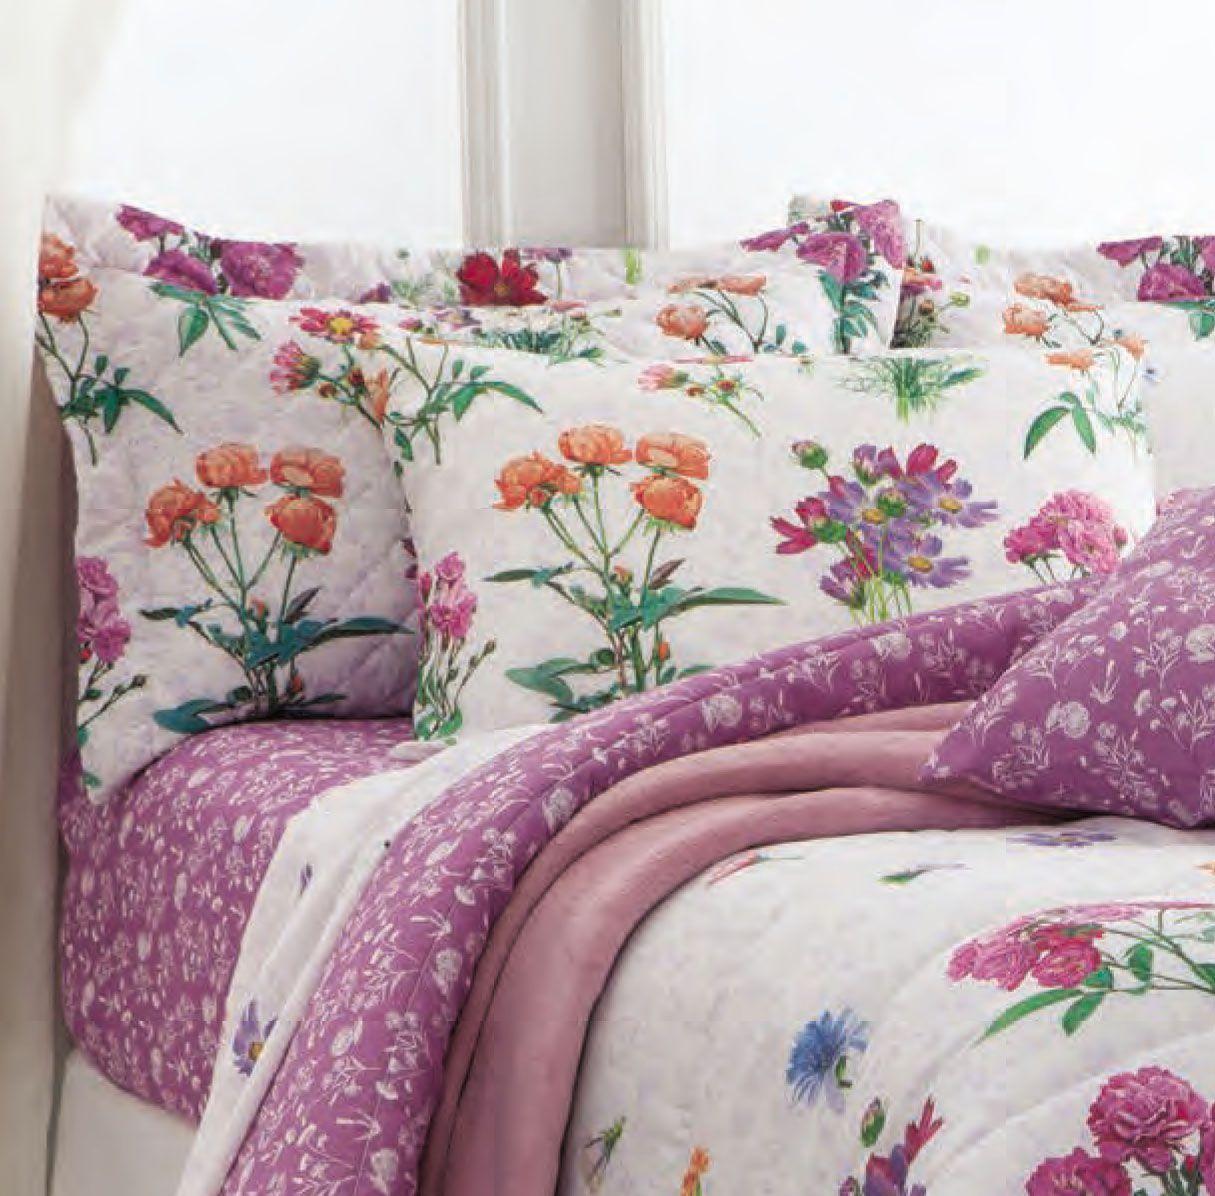 Jogo de cama casal duplo 140 fios Adriana - Realce Premium